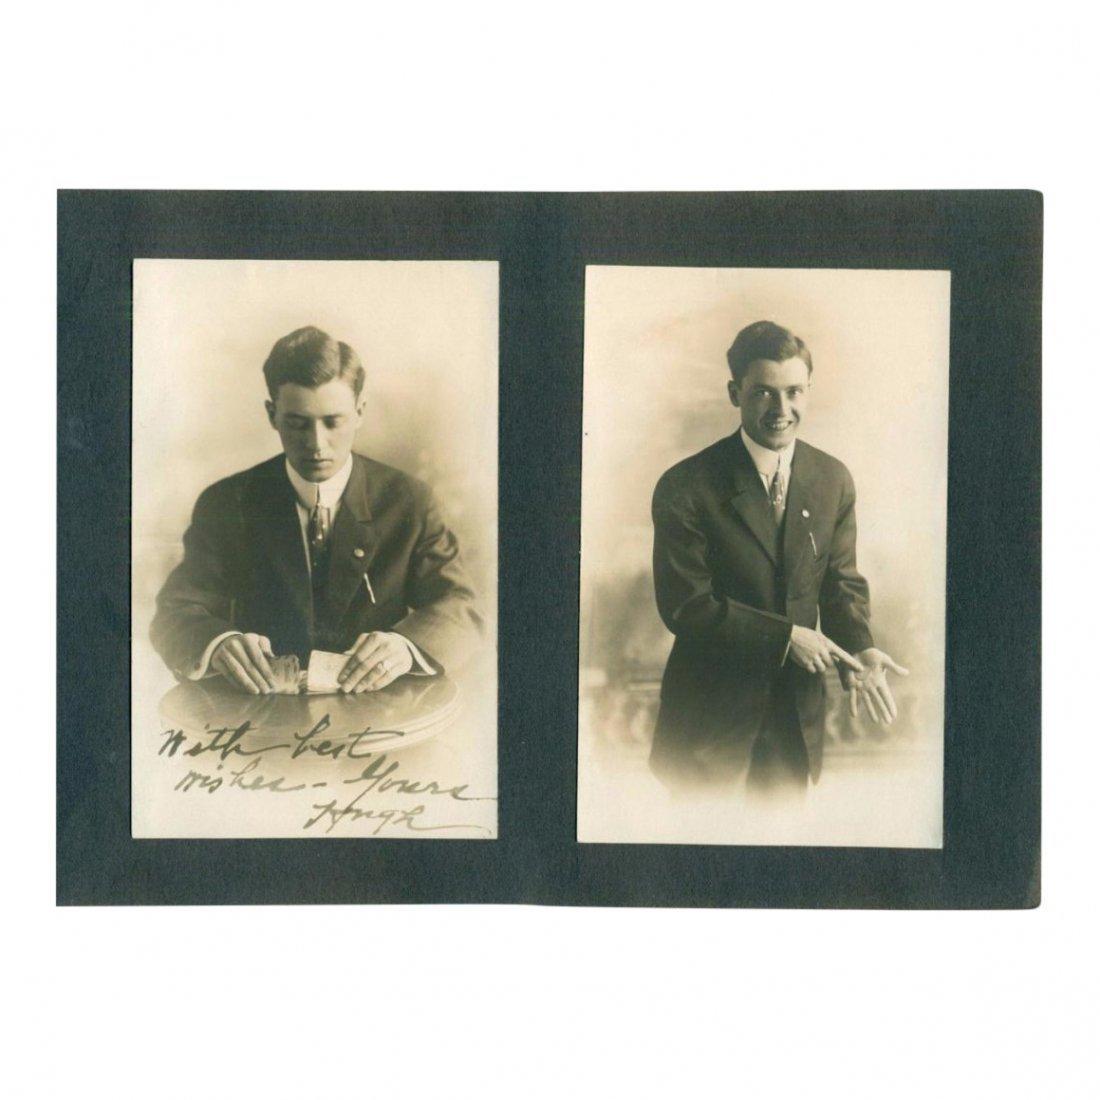 Lot of 2 Vintage Magic Trick Photos, 1920